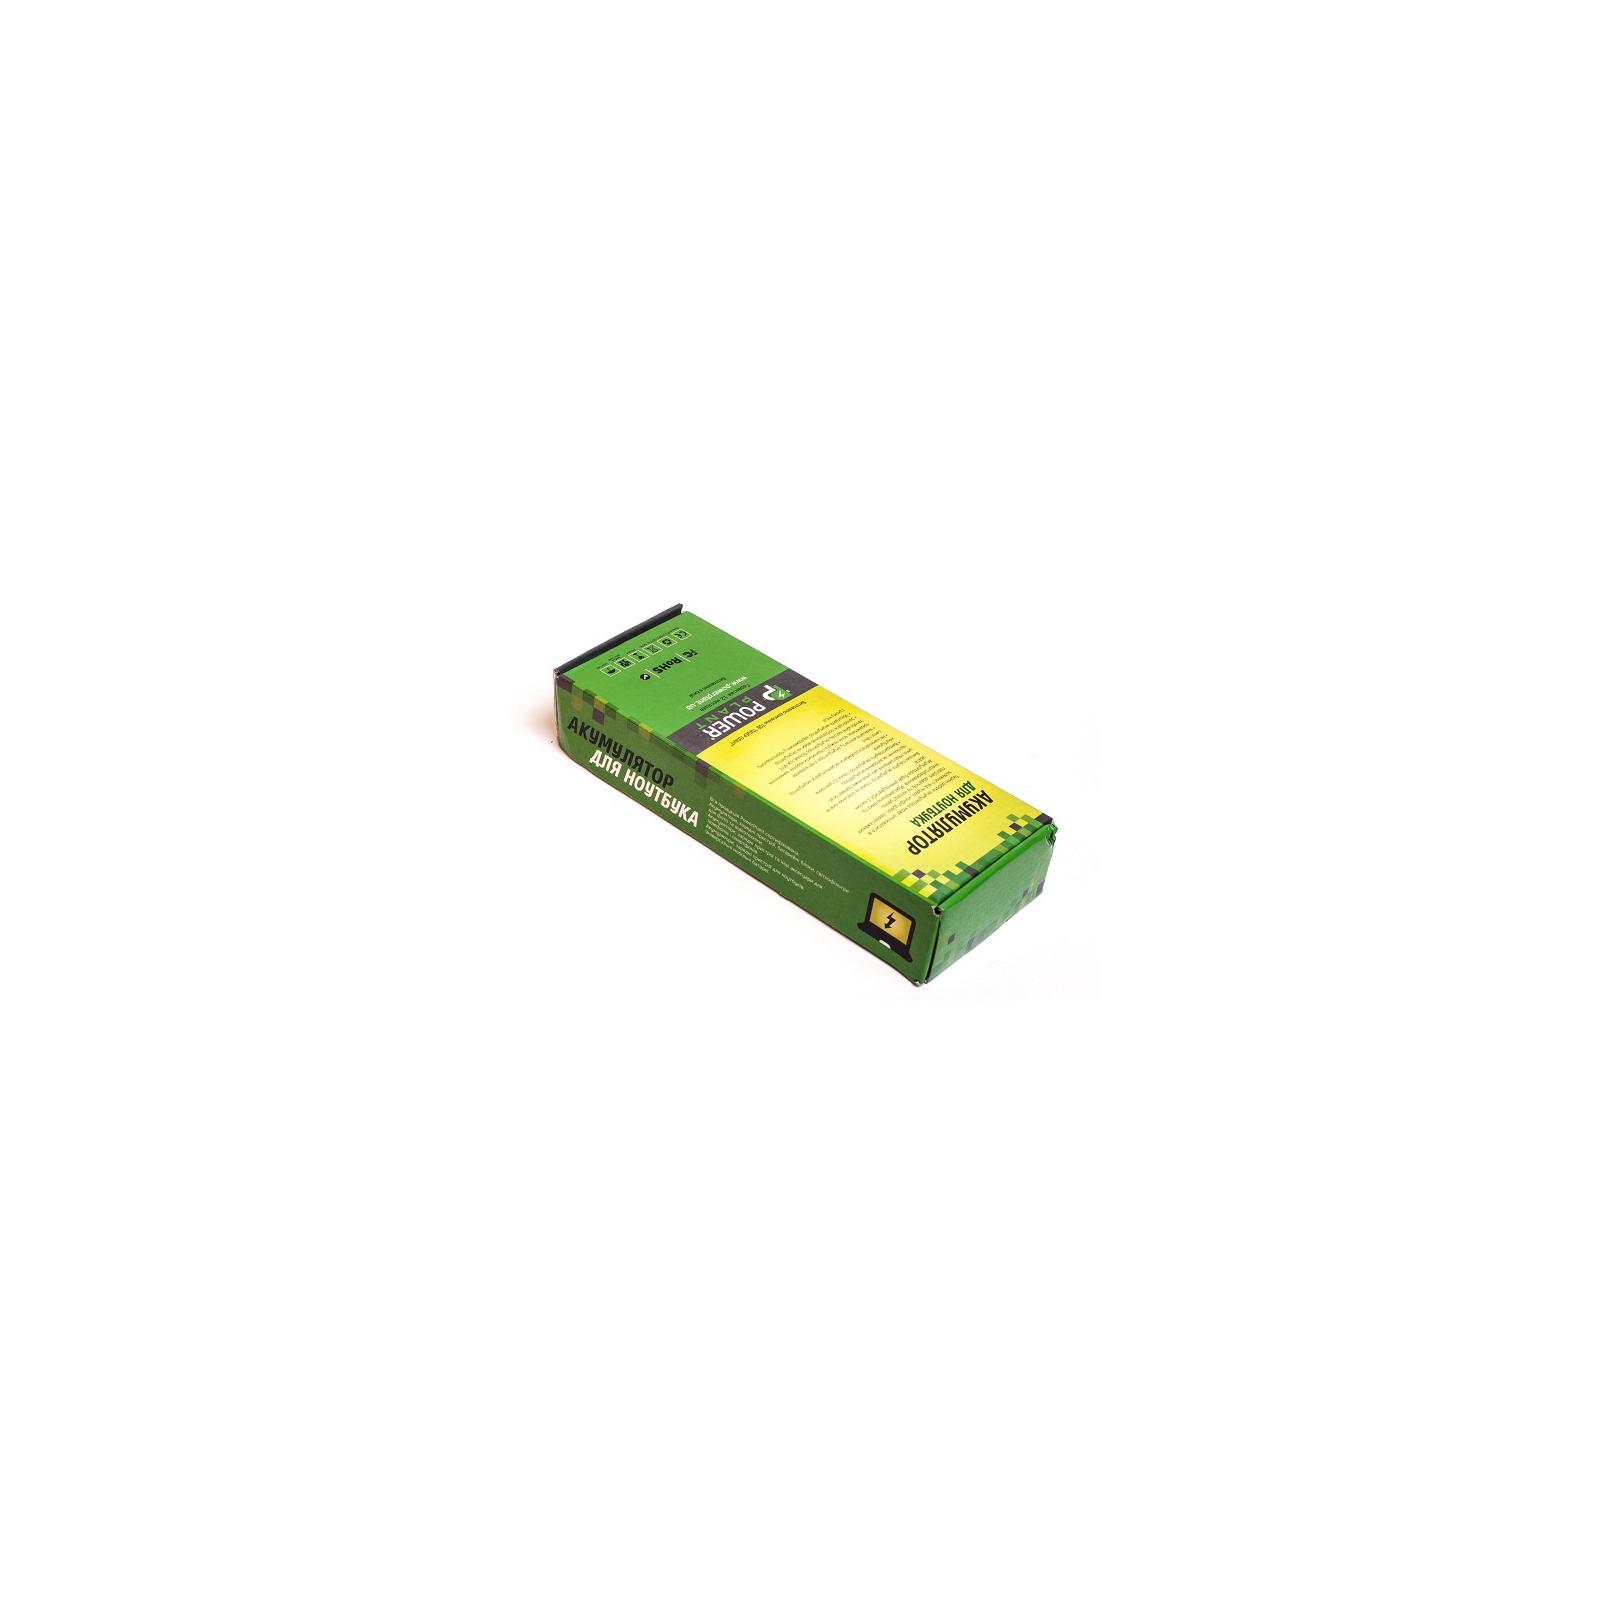 Аккумулятор для ноутбука ACER Aspire 5230 (AS07B41, AR5923LH) 11.1V 4400mAh PowerPlant (NB00000195) изображение 2